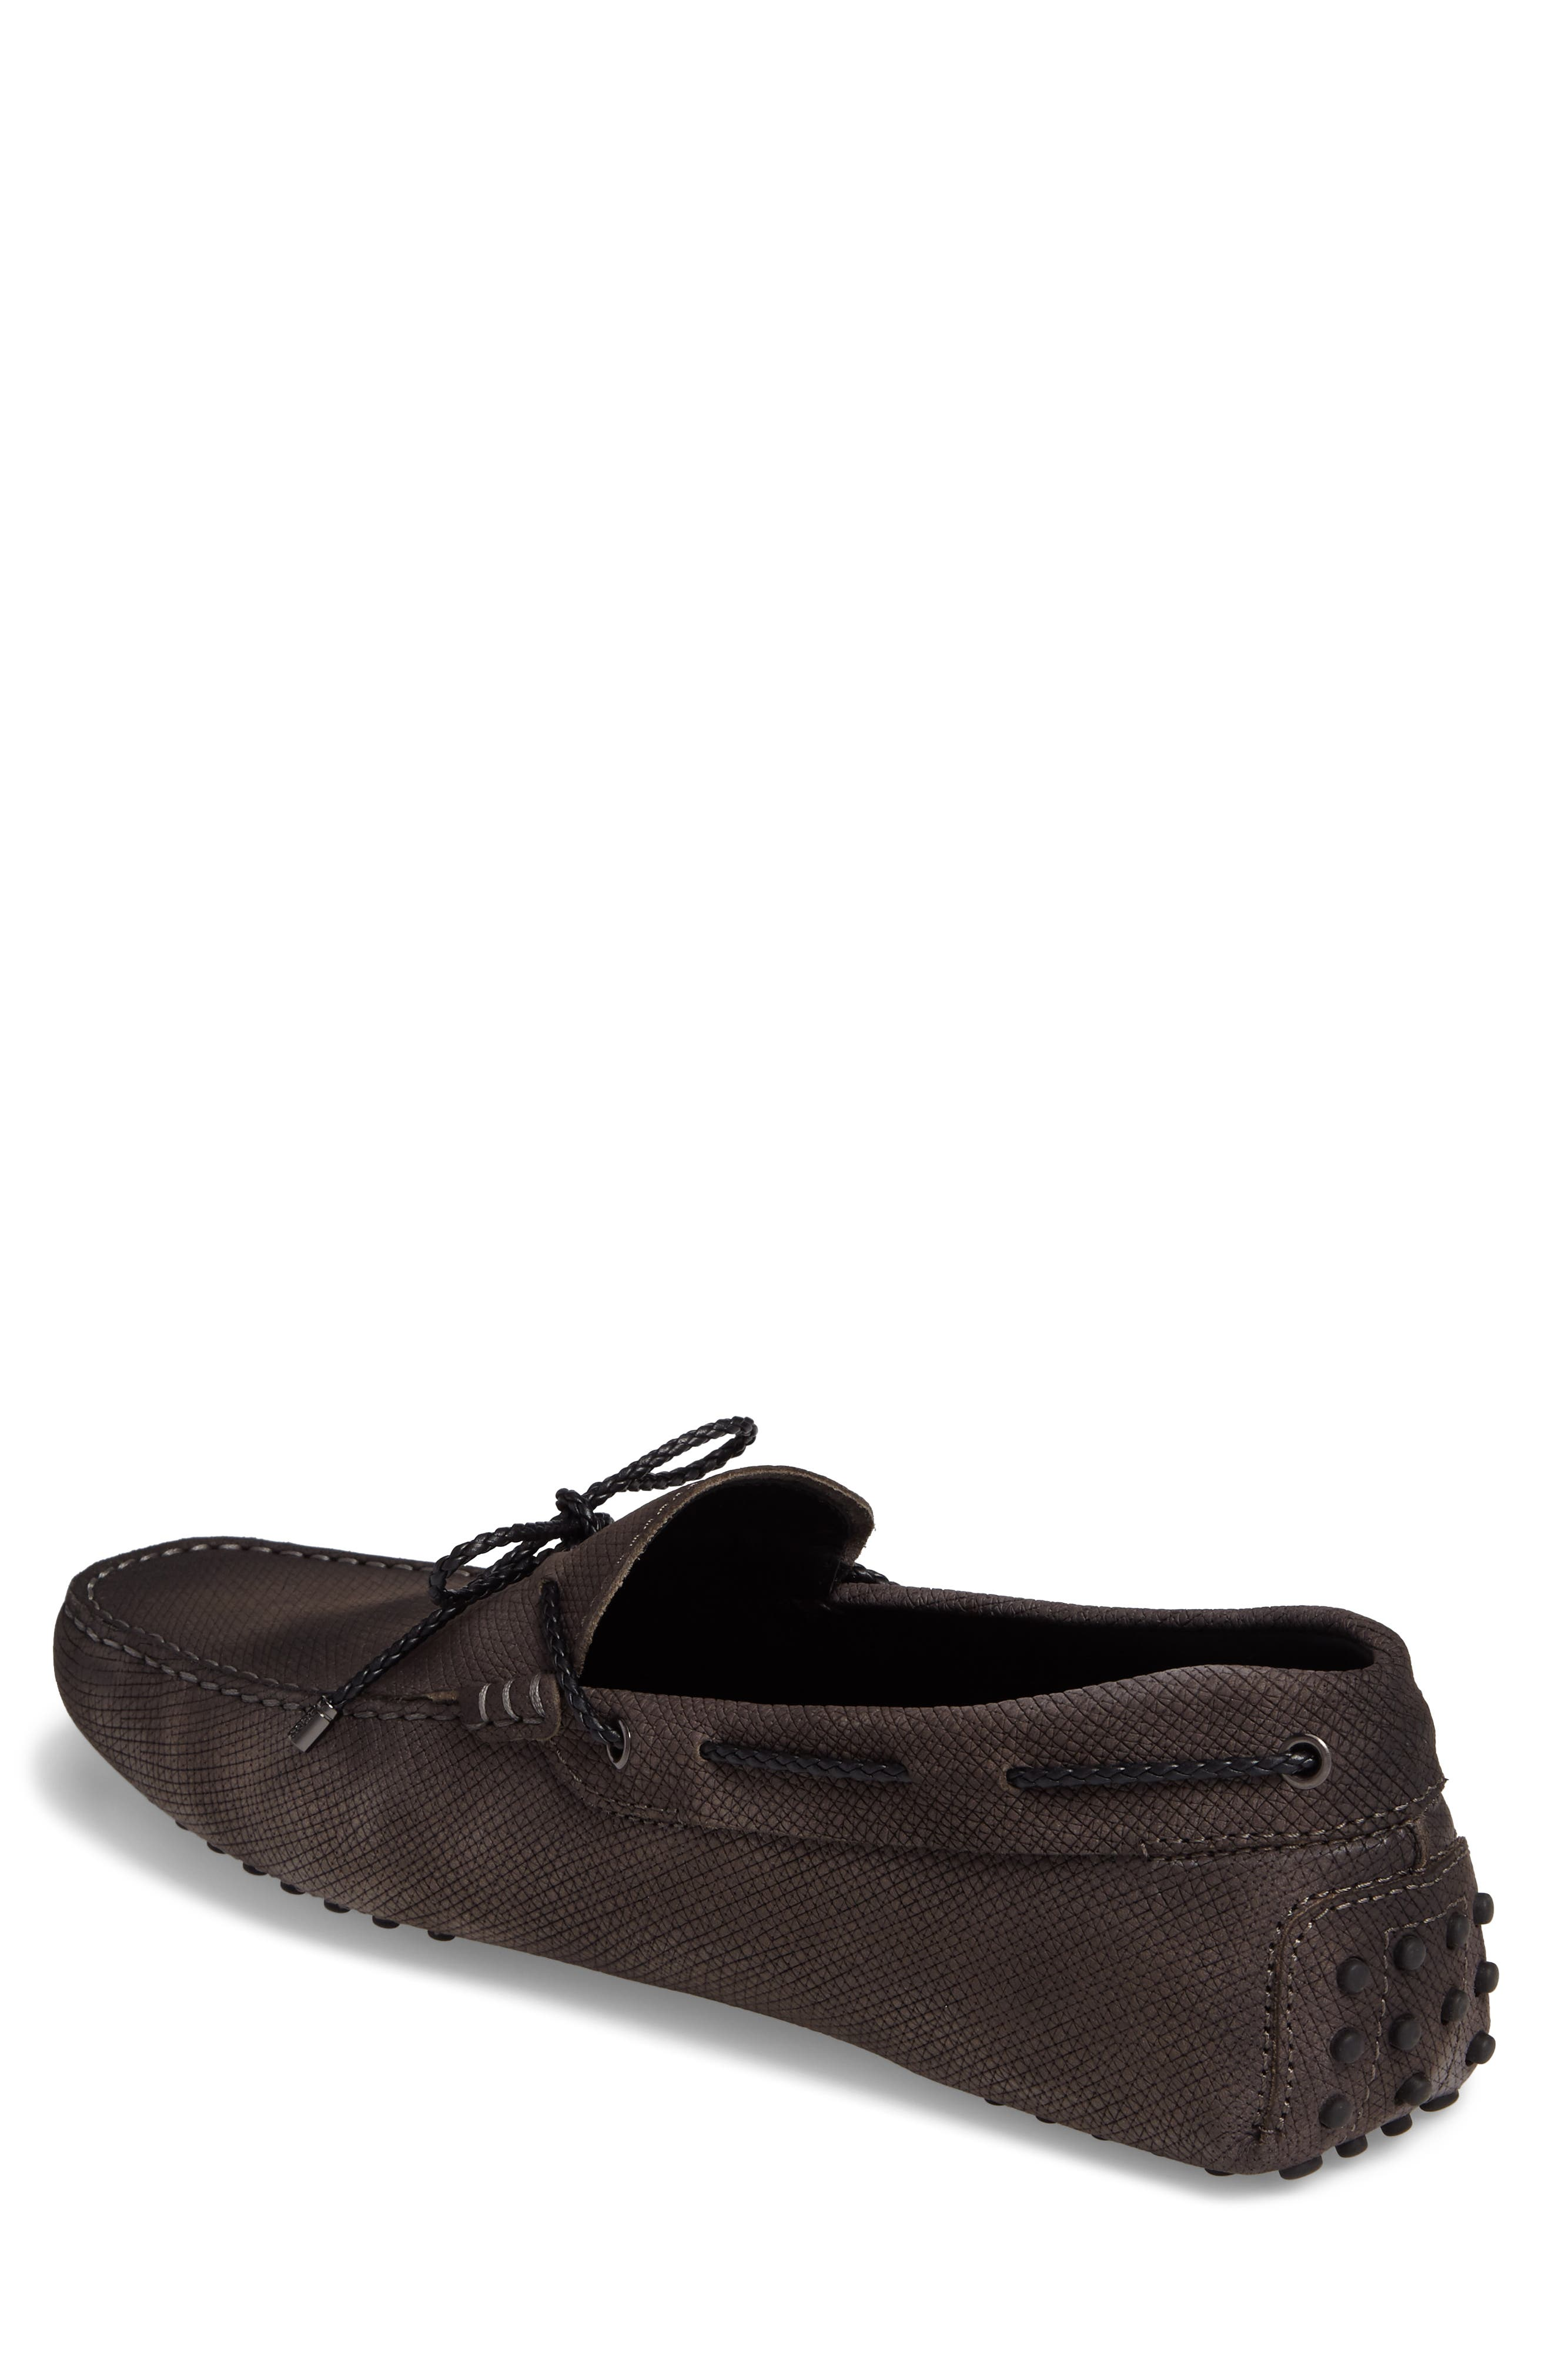 Alternate Image 2  - Tod's Gommin Textured Driving Shoe (Men)